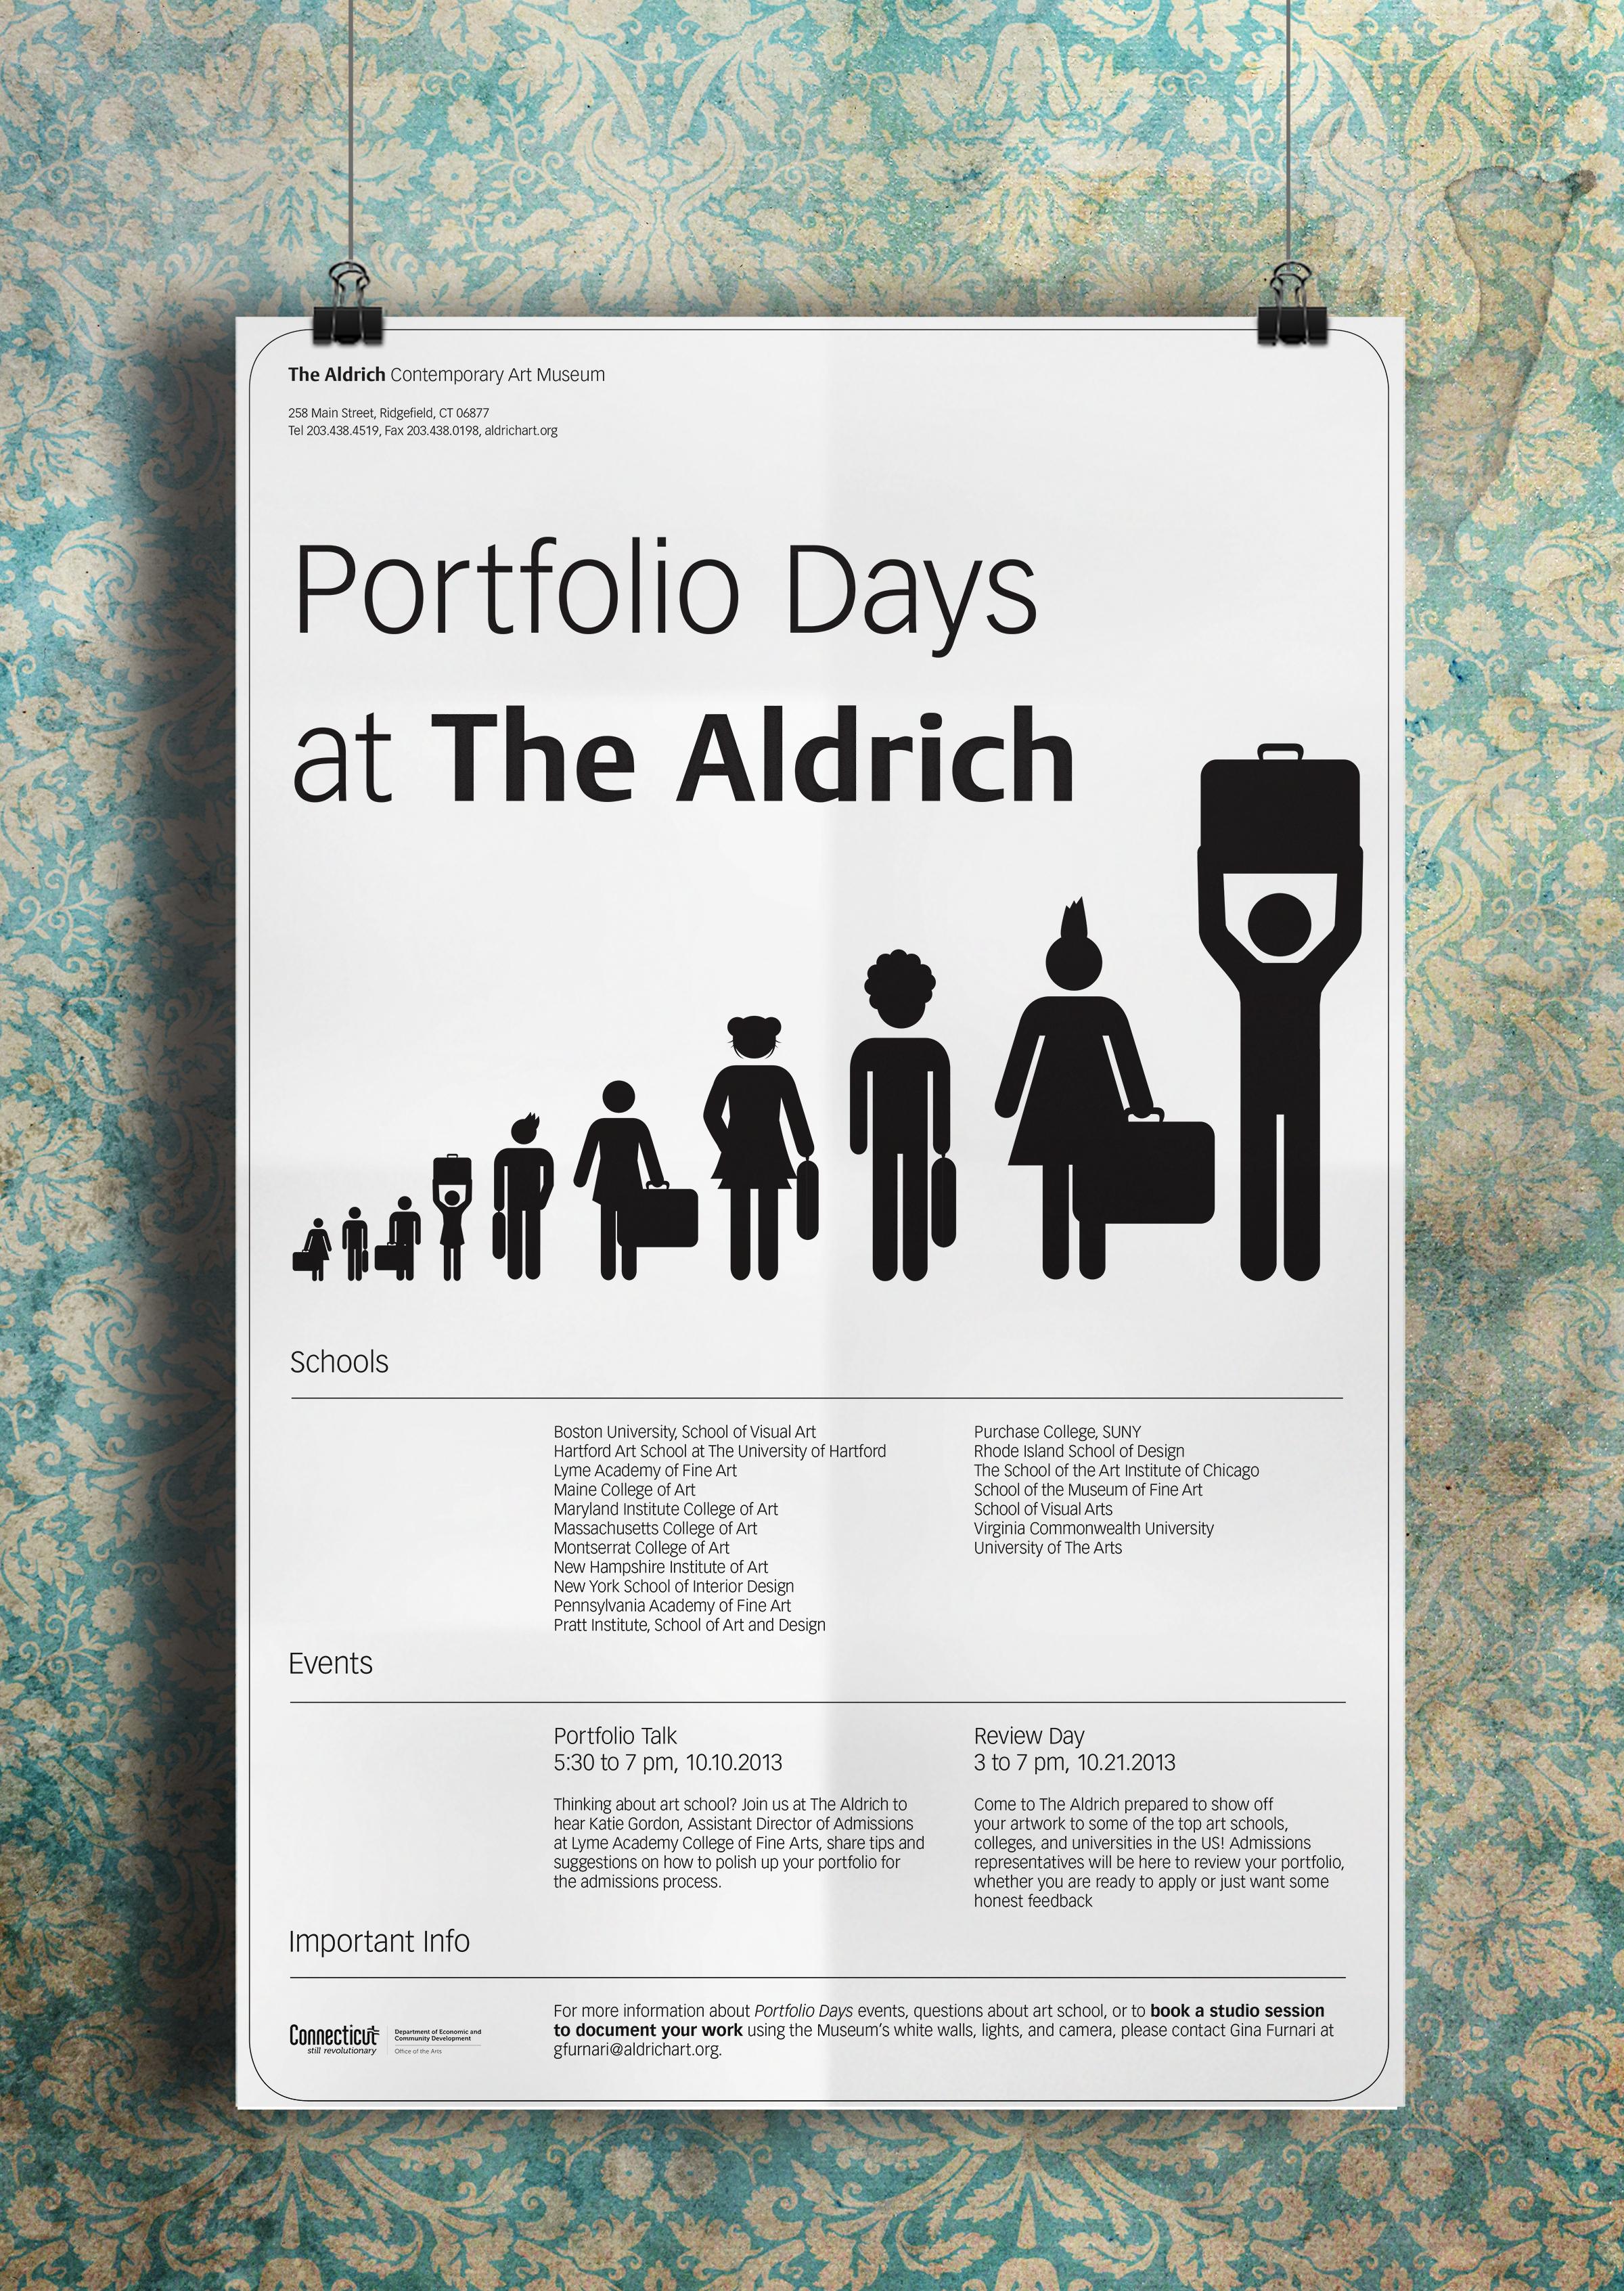 Portfolio Days 2013